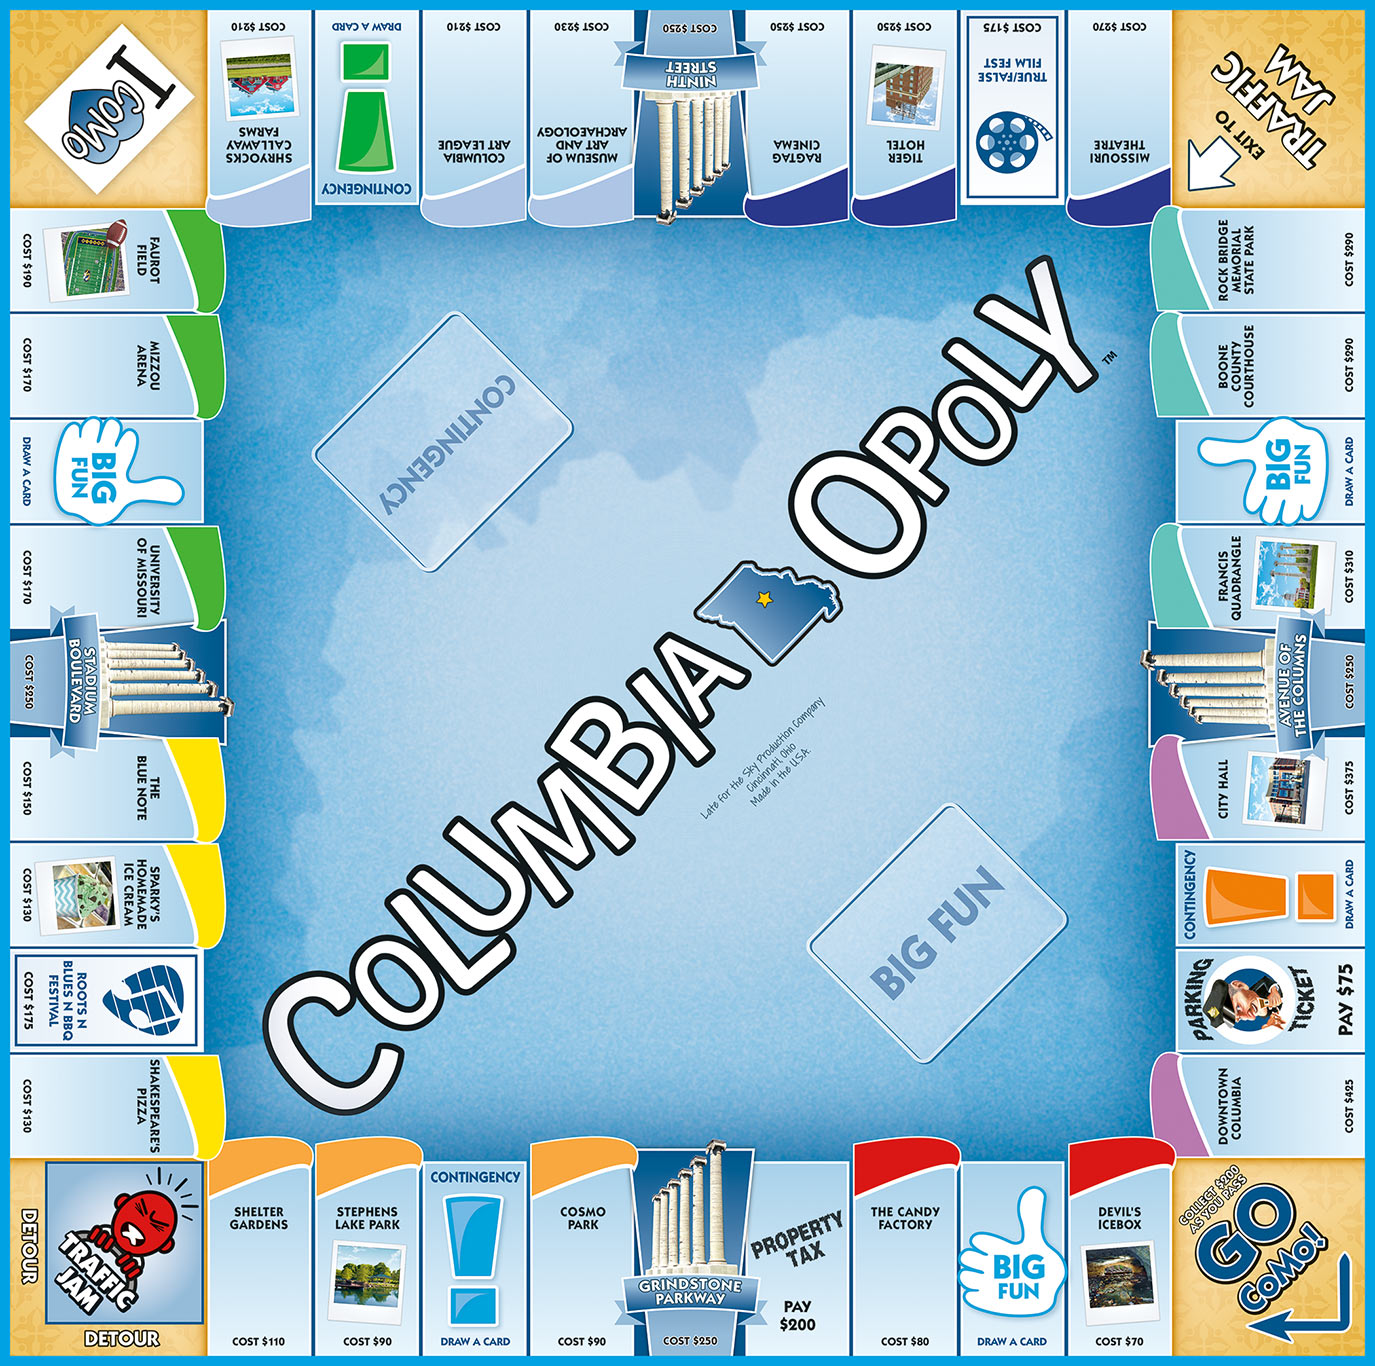 COLUMBIA-OPOLY Board Game